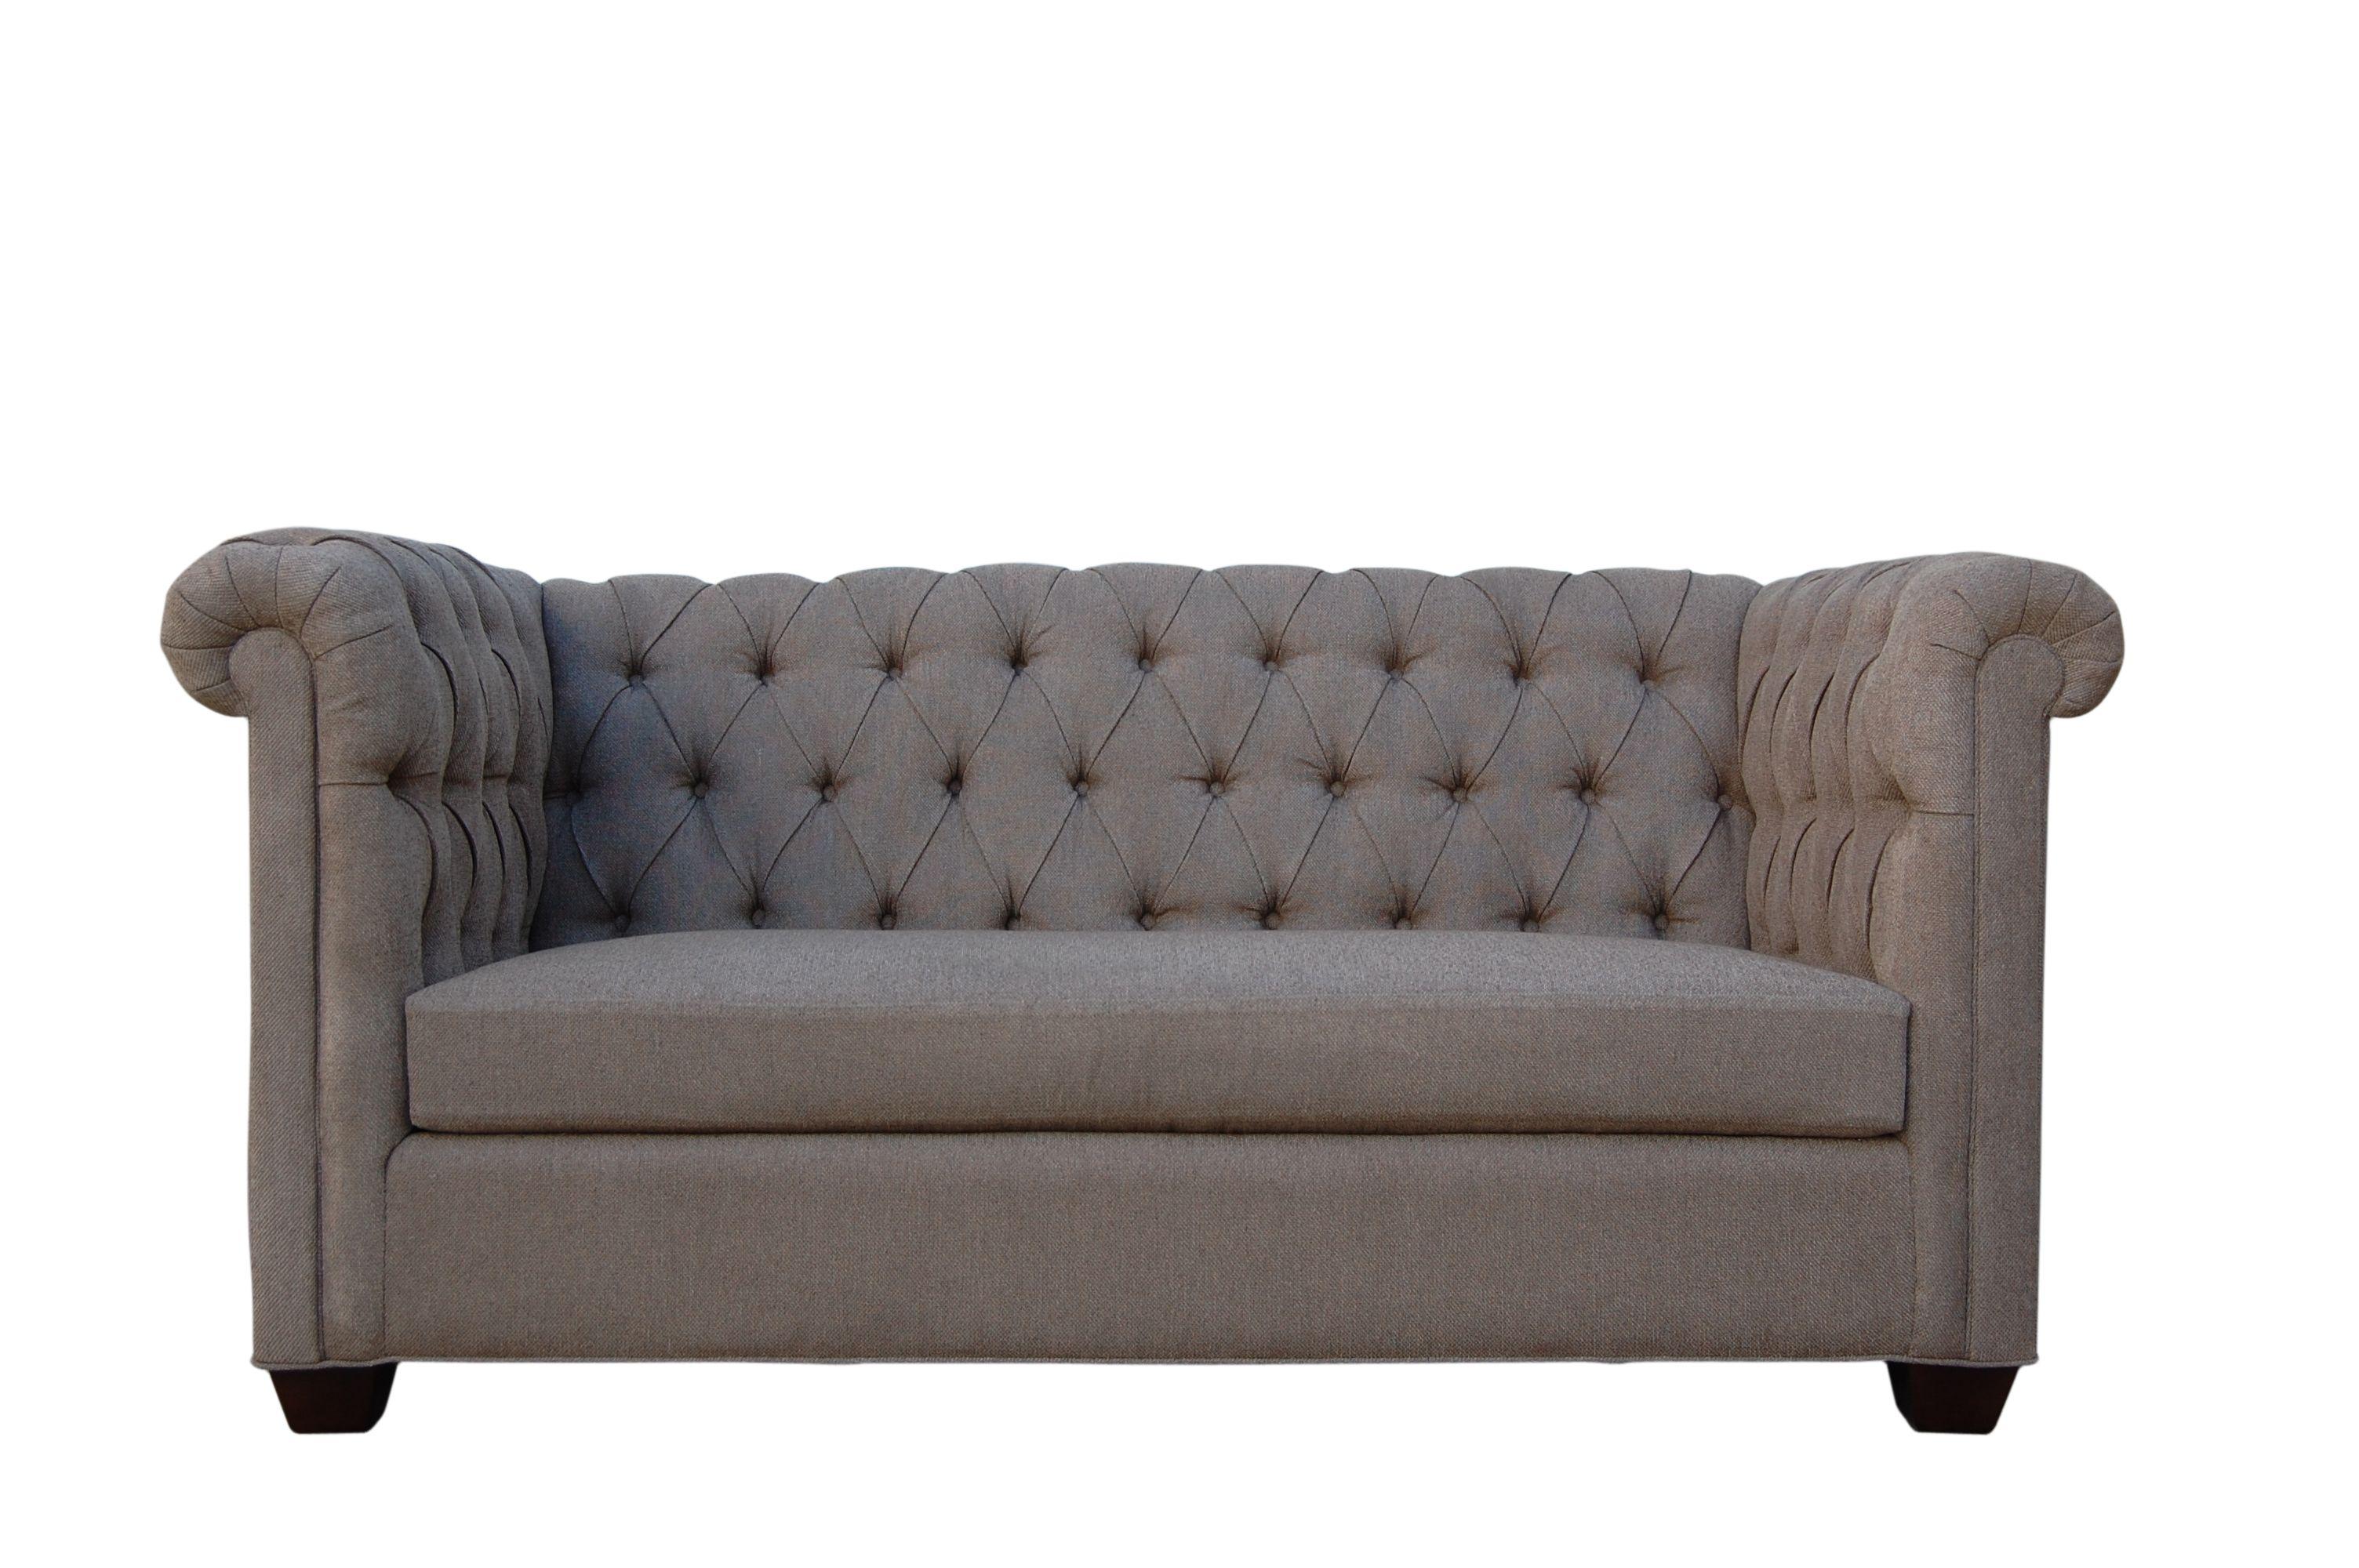 Astounding Kara Tufted Sofa Products In 2019 Tufted Sofa Modern Machost Co Dining Chair Design Ideas Machostcouk